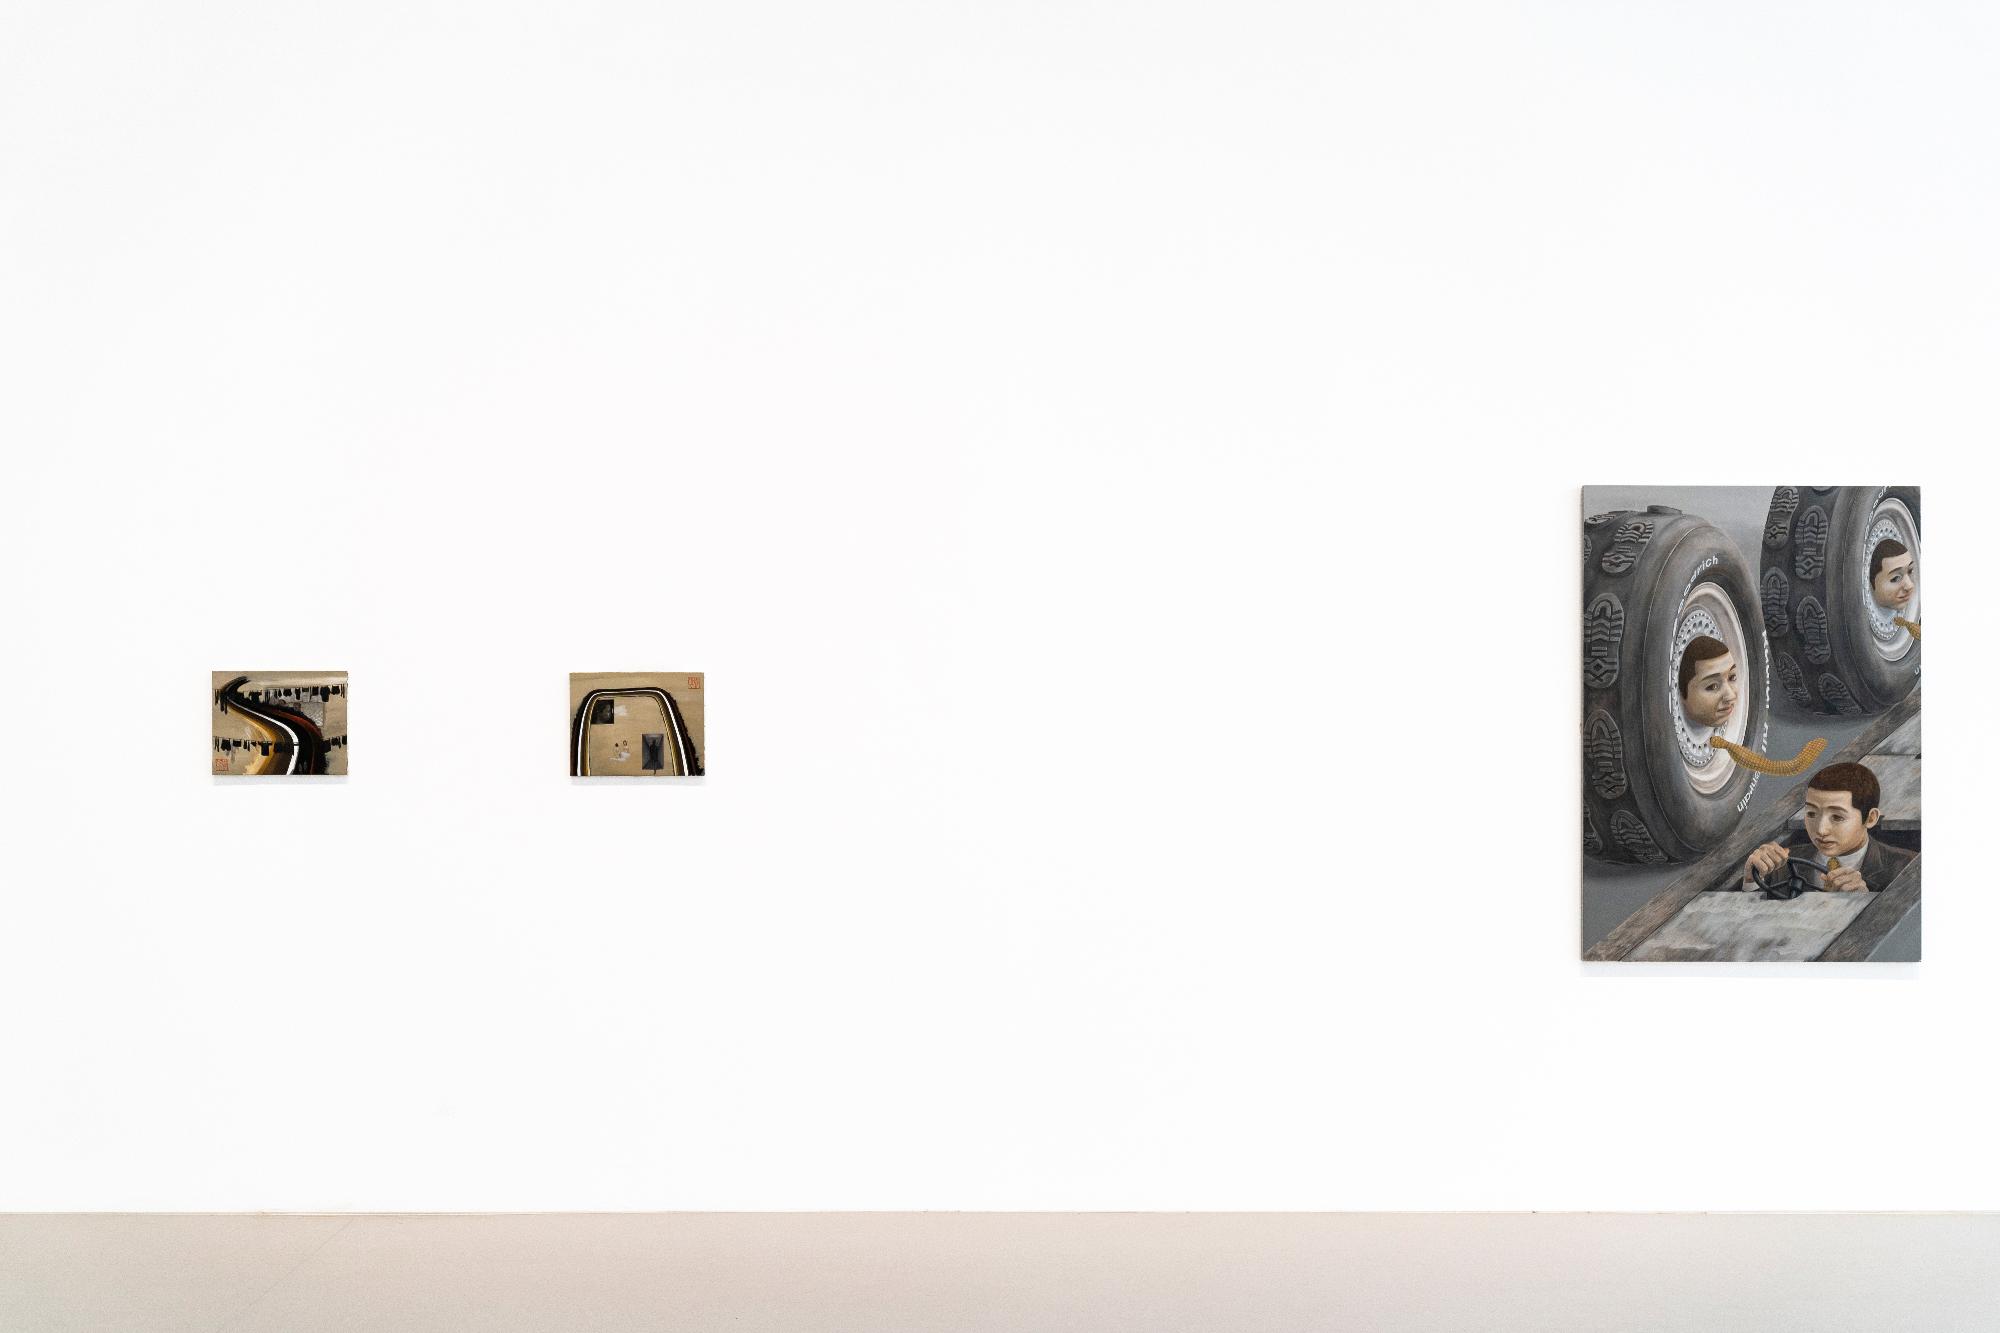 CaballeroCosmica-ExhibitionPhoto-Tetsuya-Ishida-palaciovelazquez-11-p.jpg